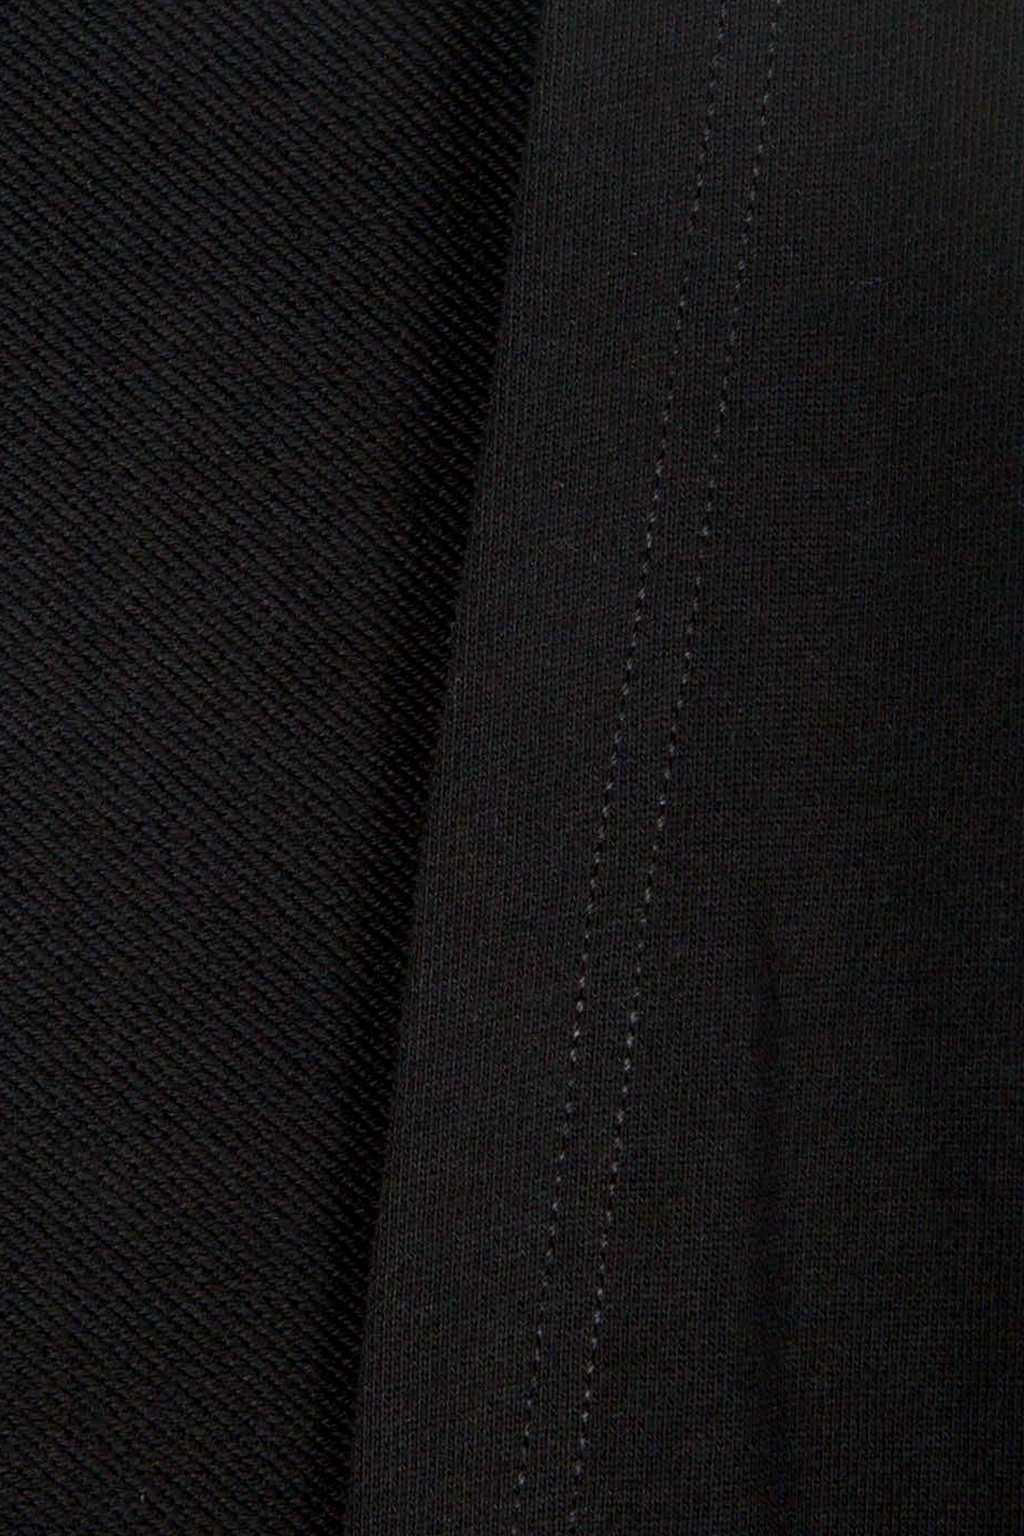 Cardigan 1438 Black 8